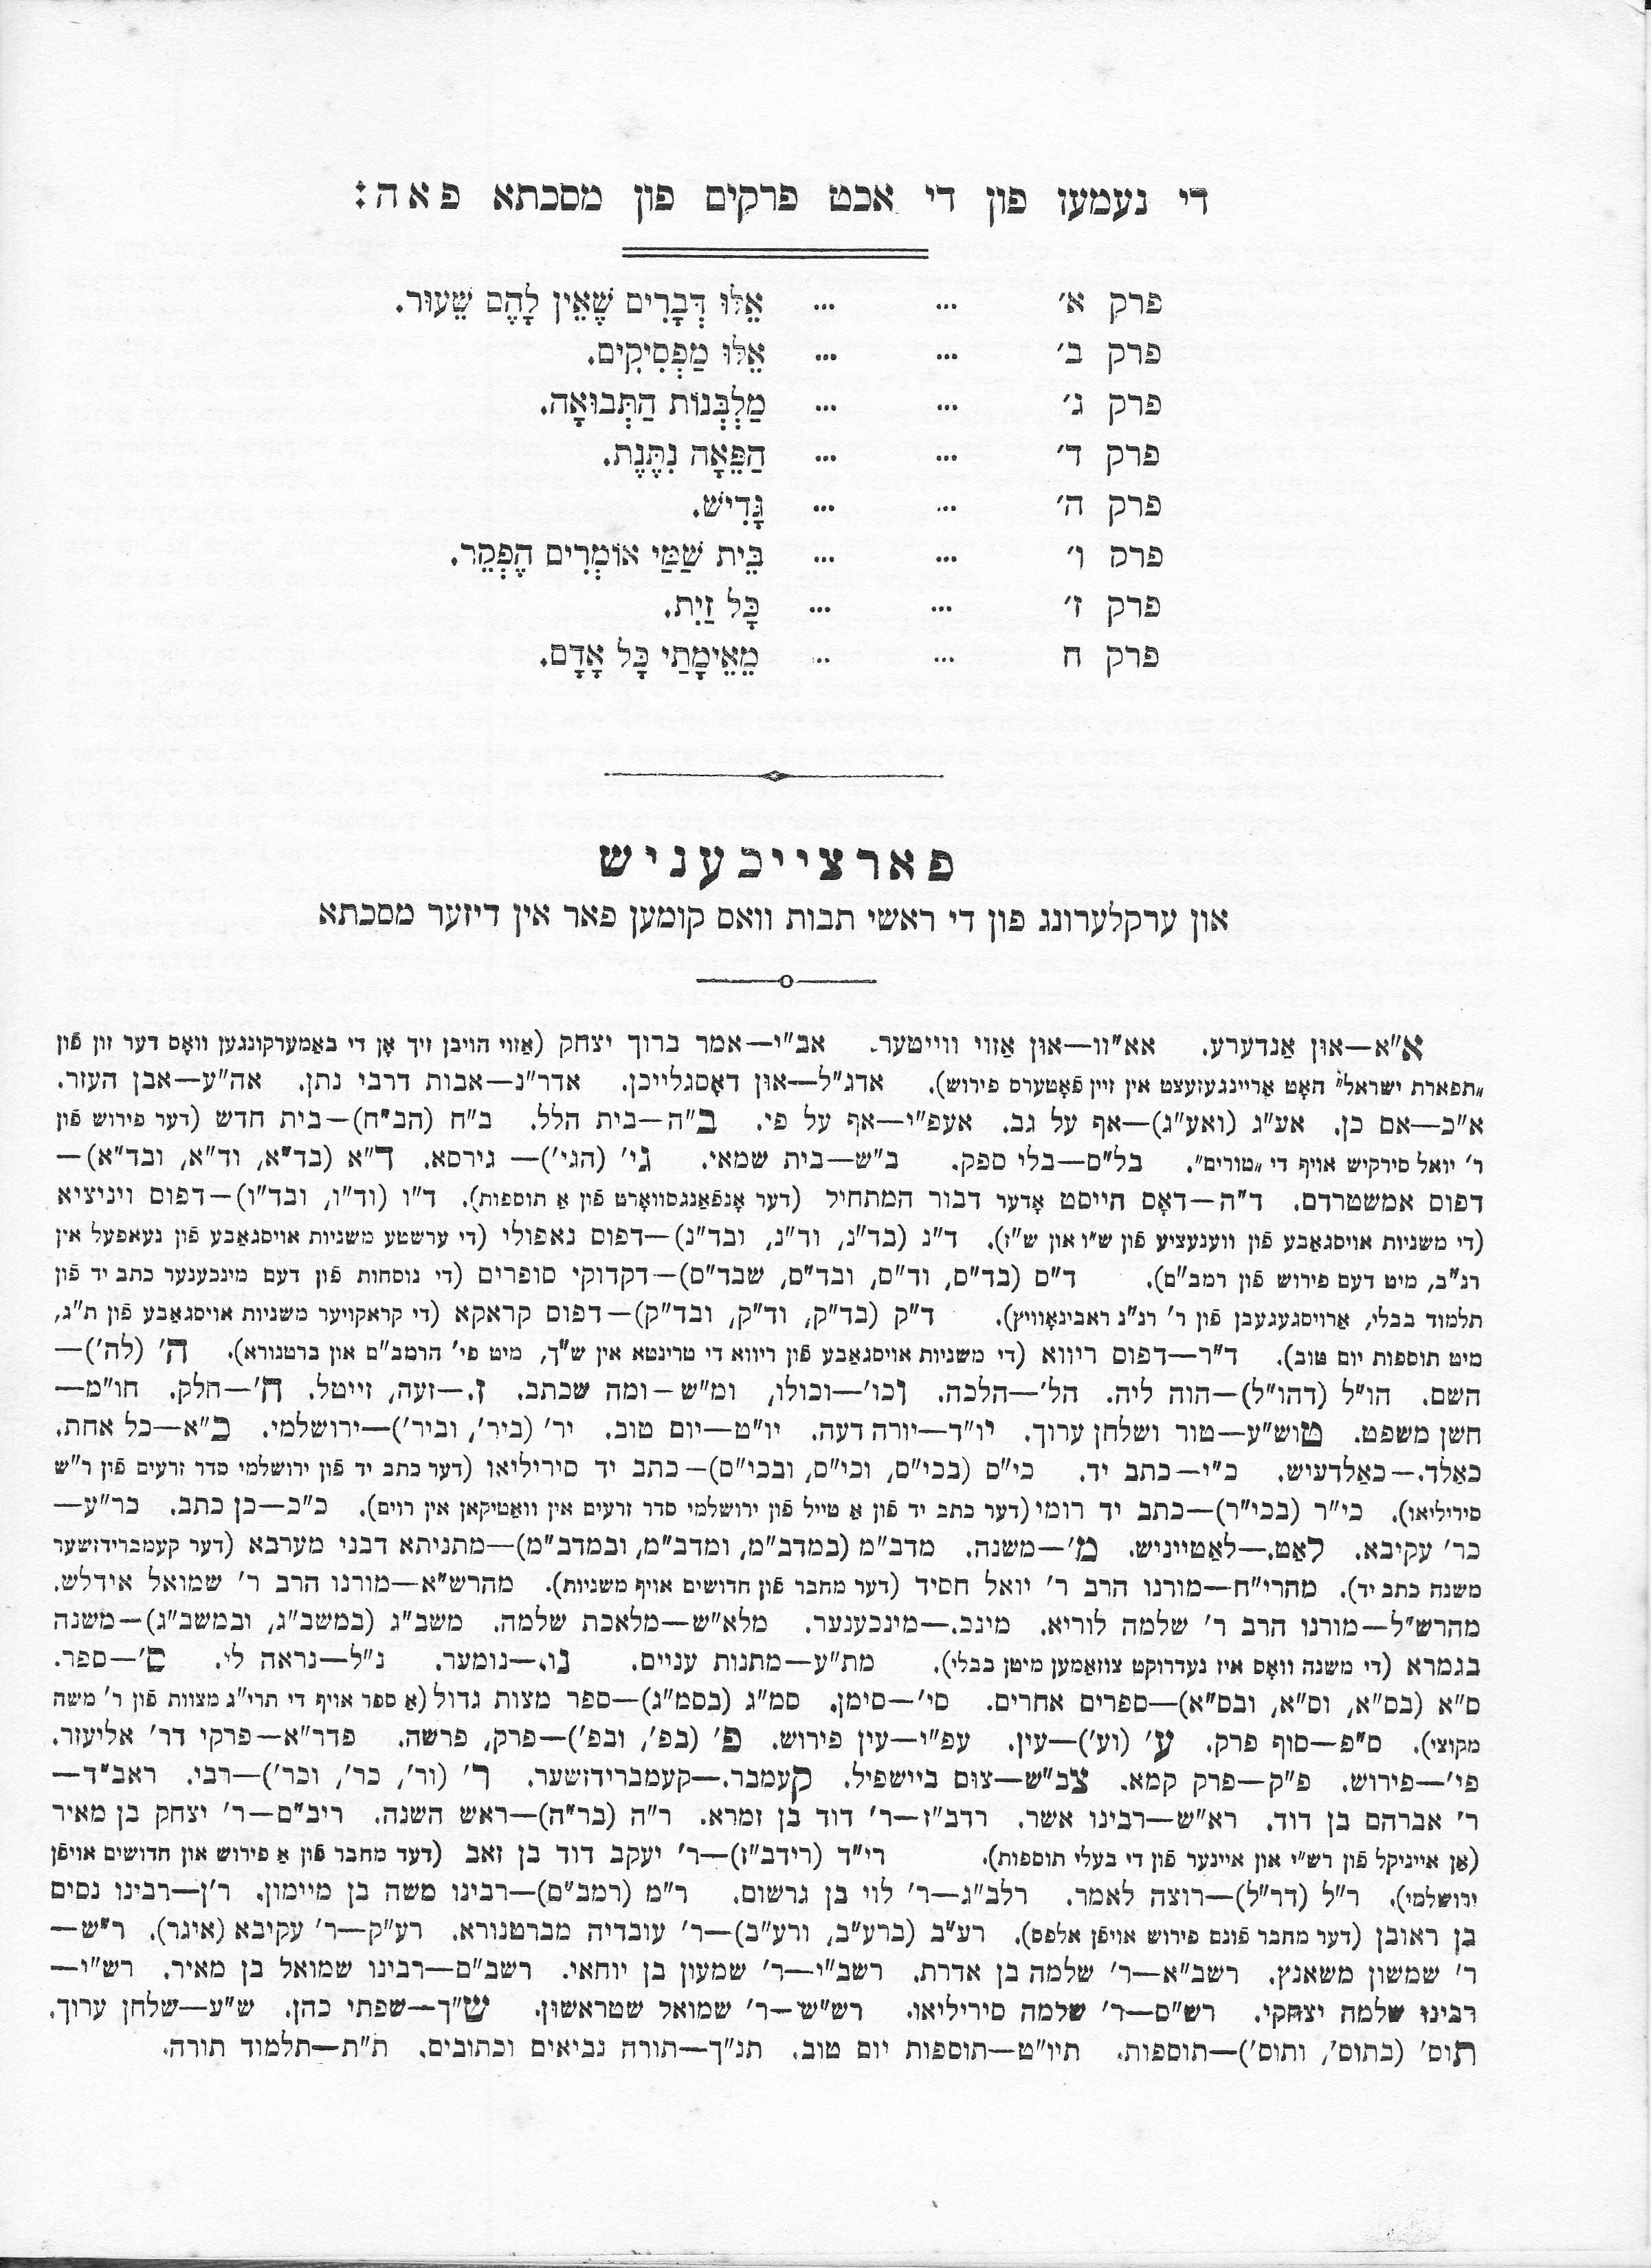 5n Peah Yiddish_0004